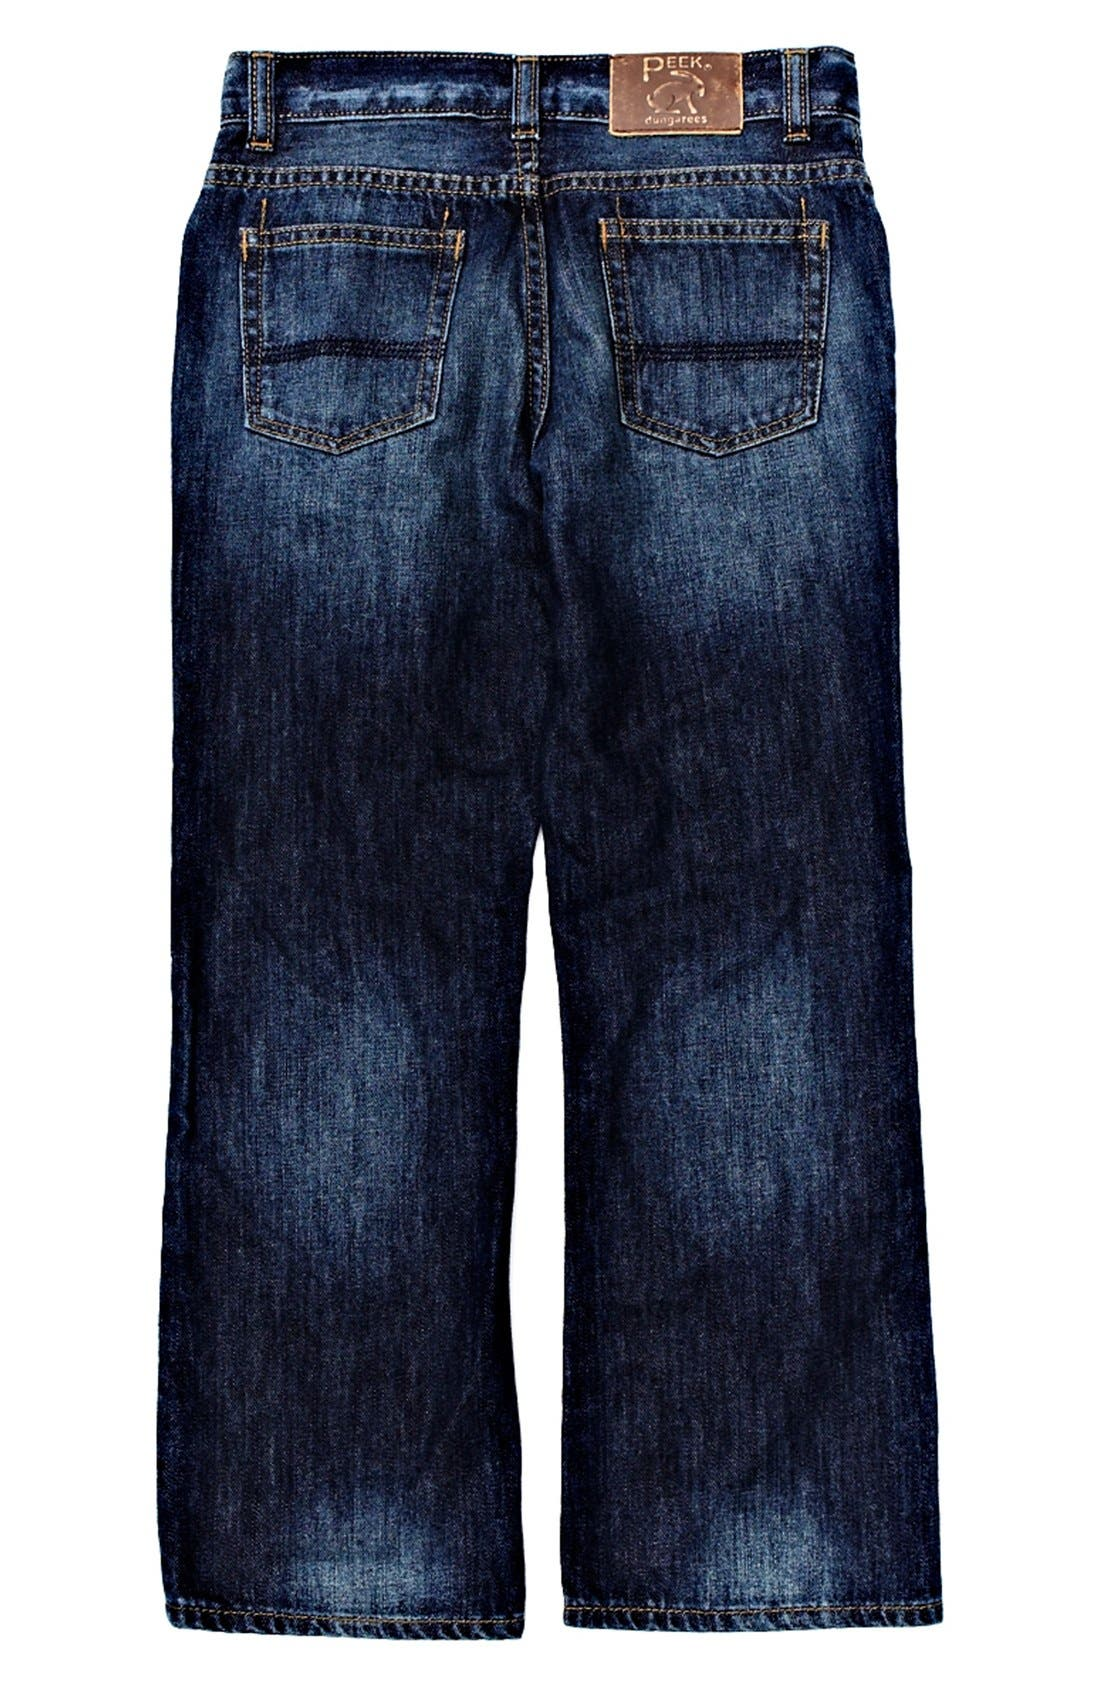 Alternate Image 1 Selected - Peek 'Sullivan' Jeans (Toddler Boys, Little Boys & Big Boys)